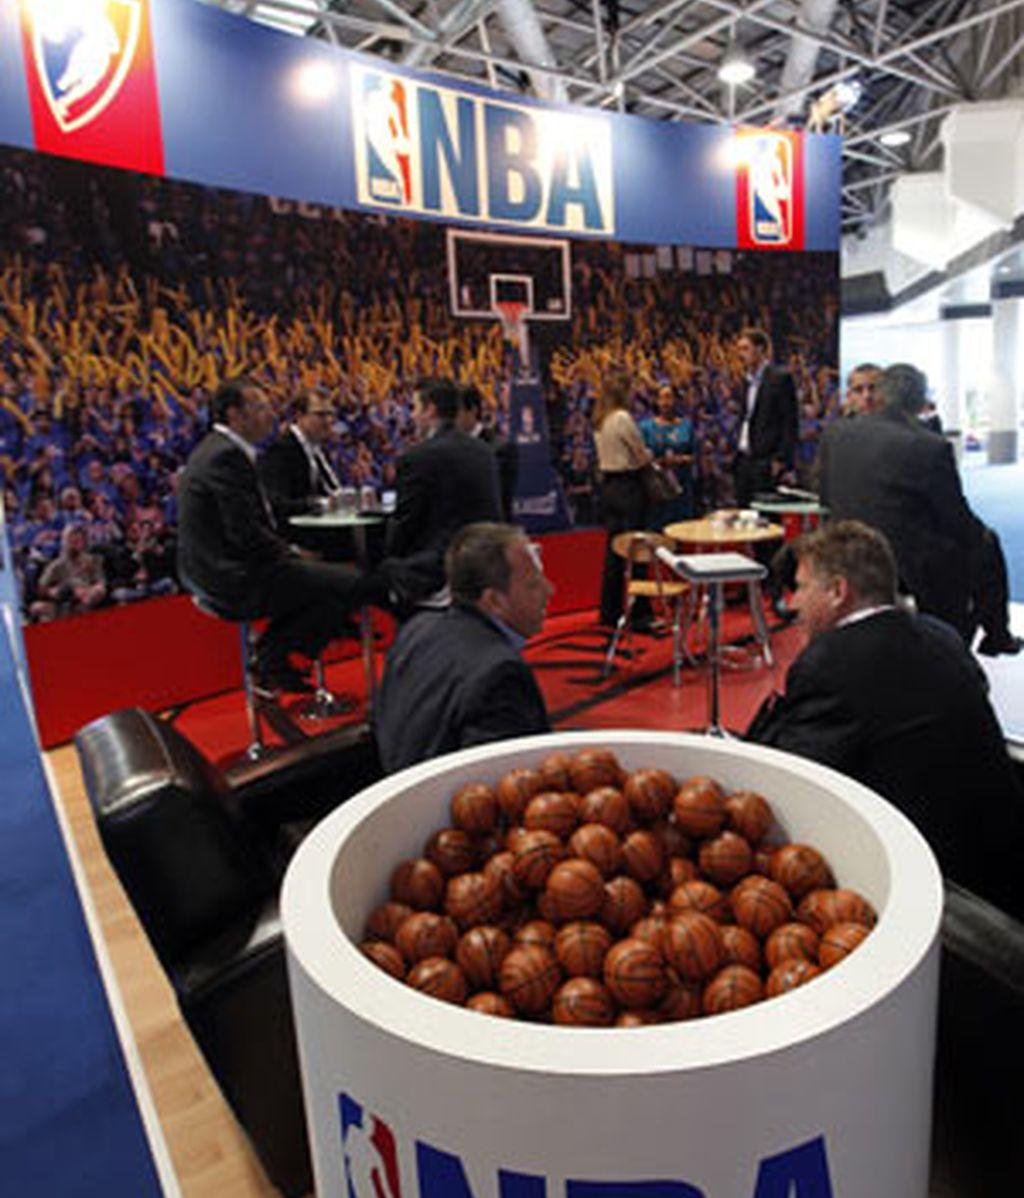 La NBA contiúa parada, al menos, hasta diciembre FOTO: REUTERS